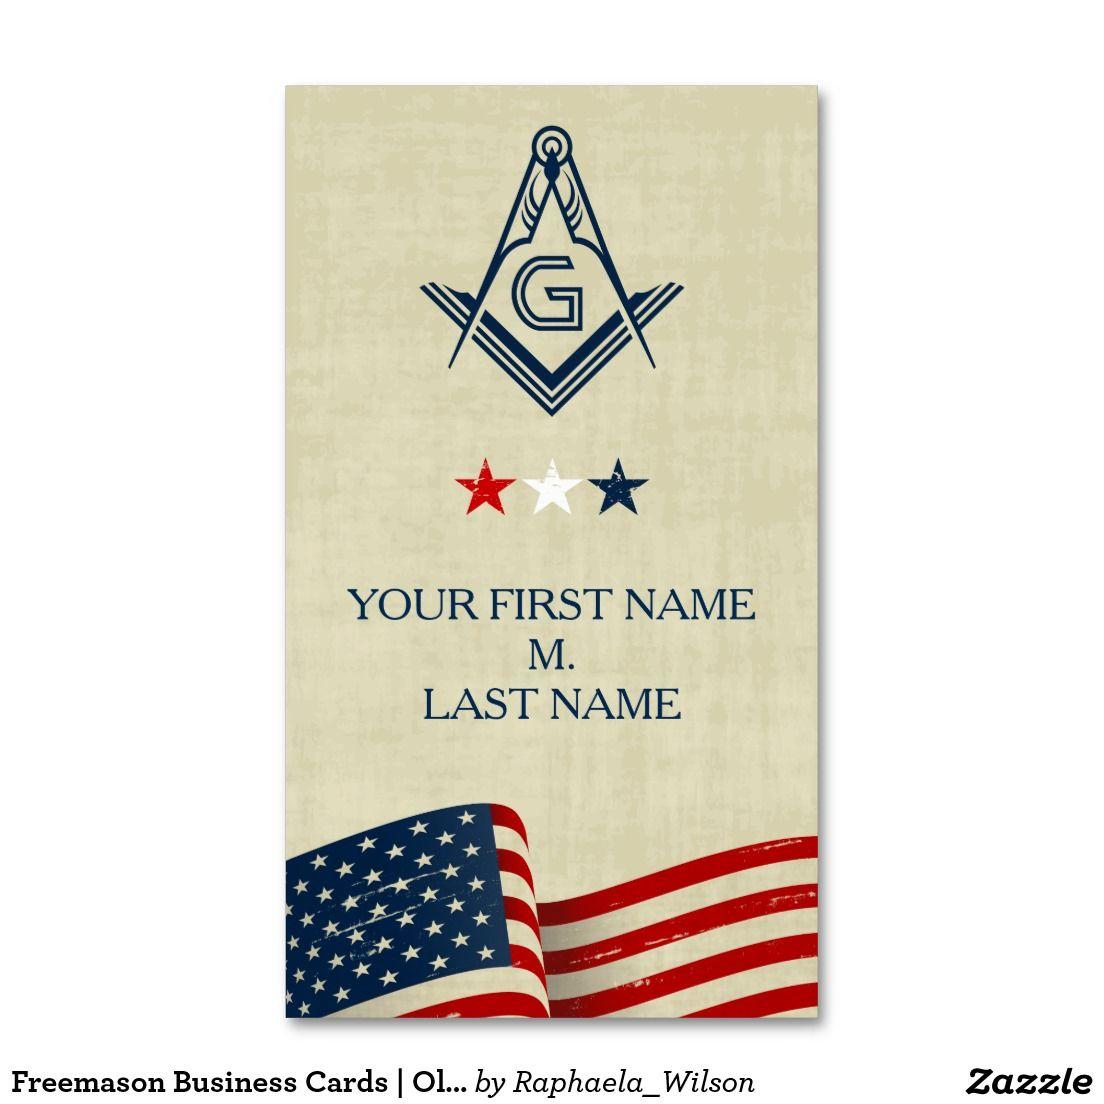 Freemason Business Cards | Old Glory American Flag | Custom Masonic ...